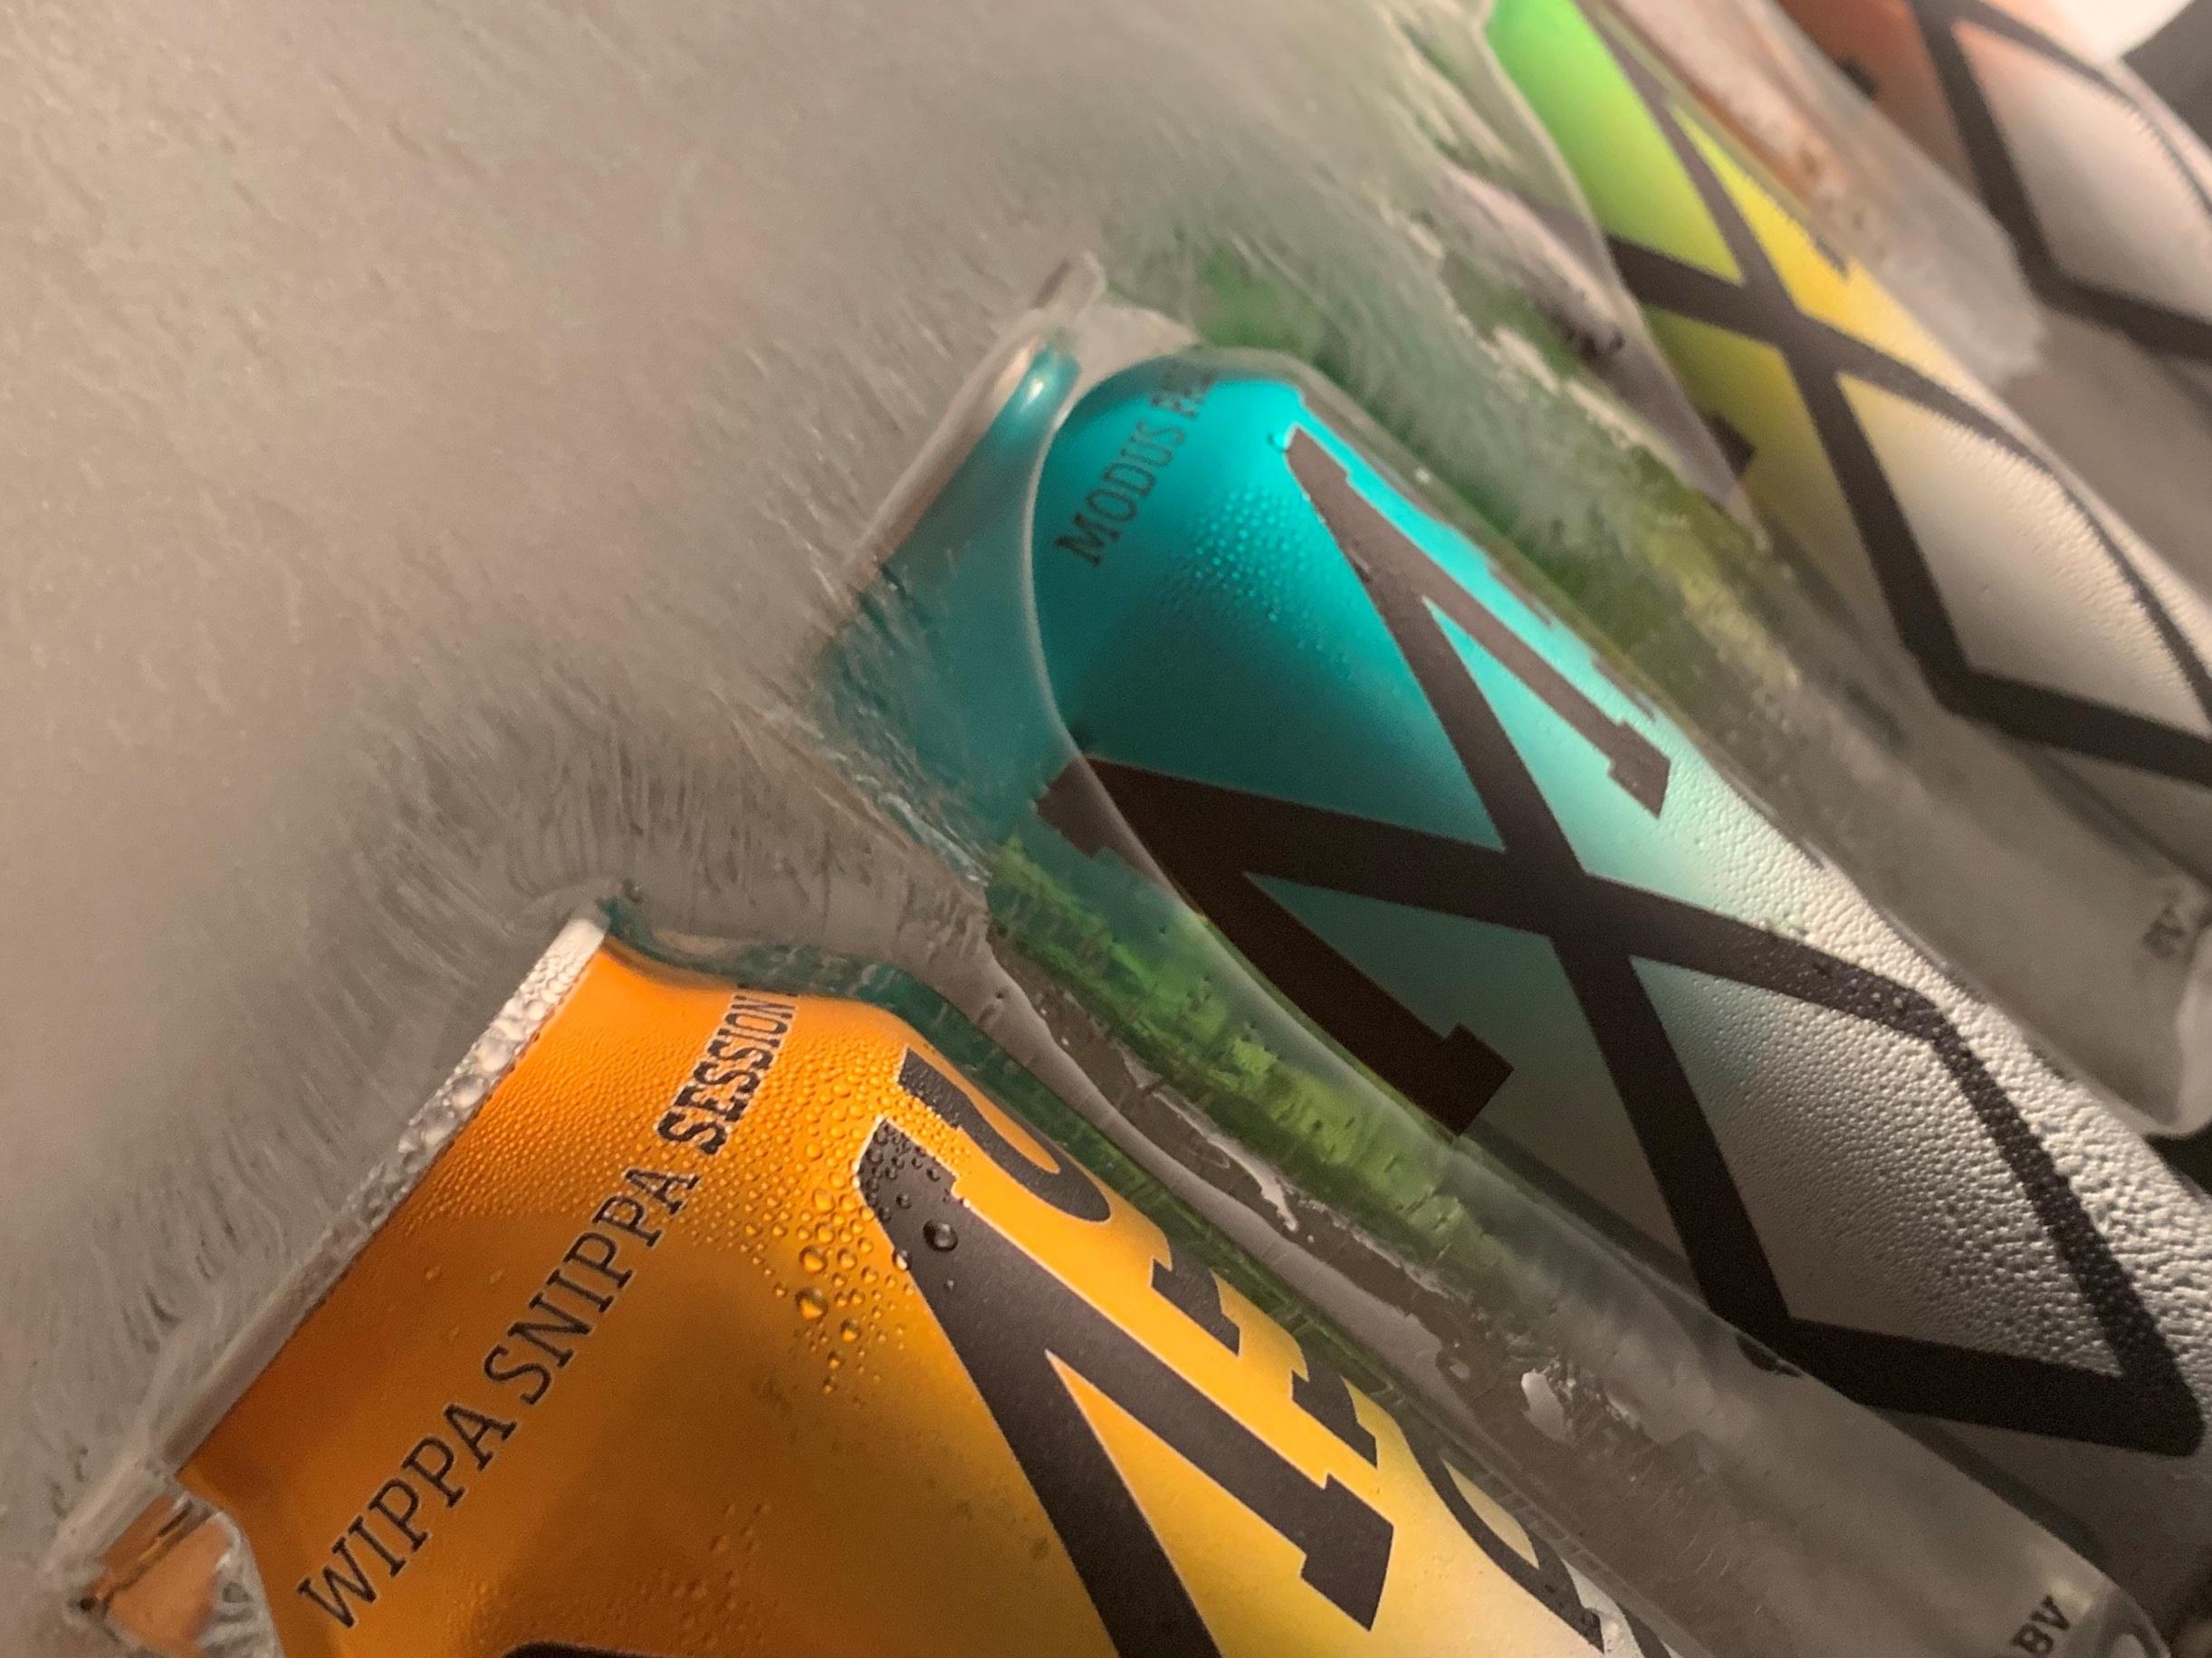 Modus Operandi new cans